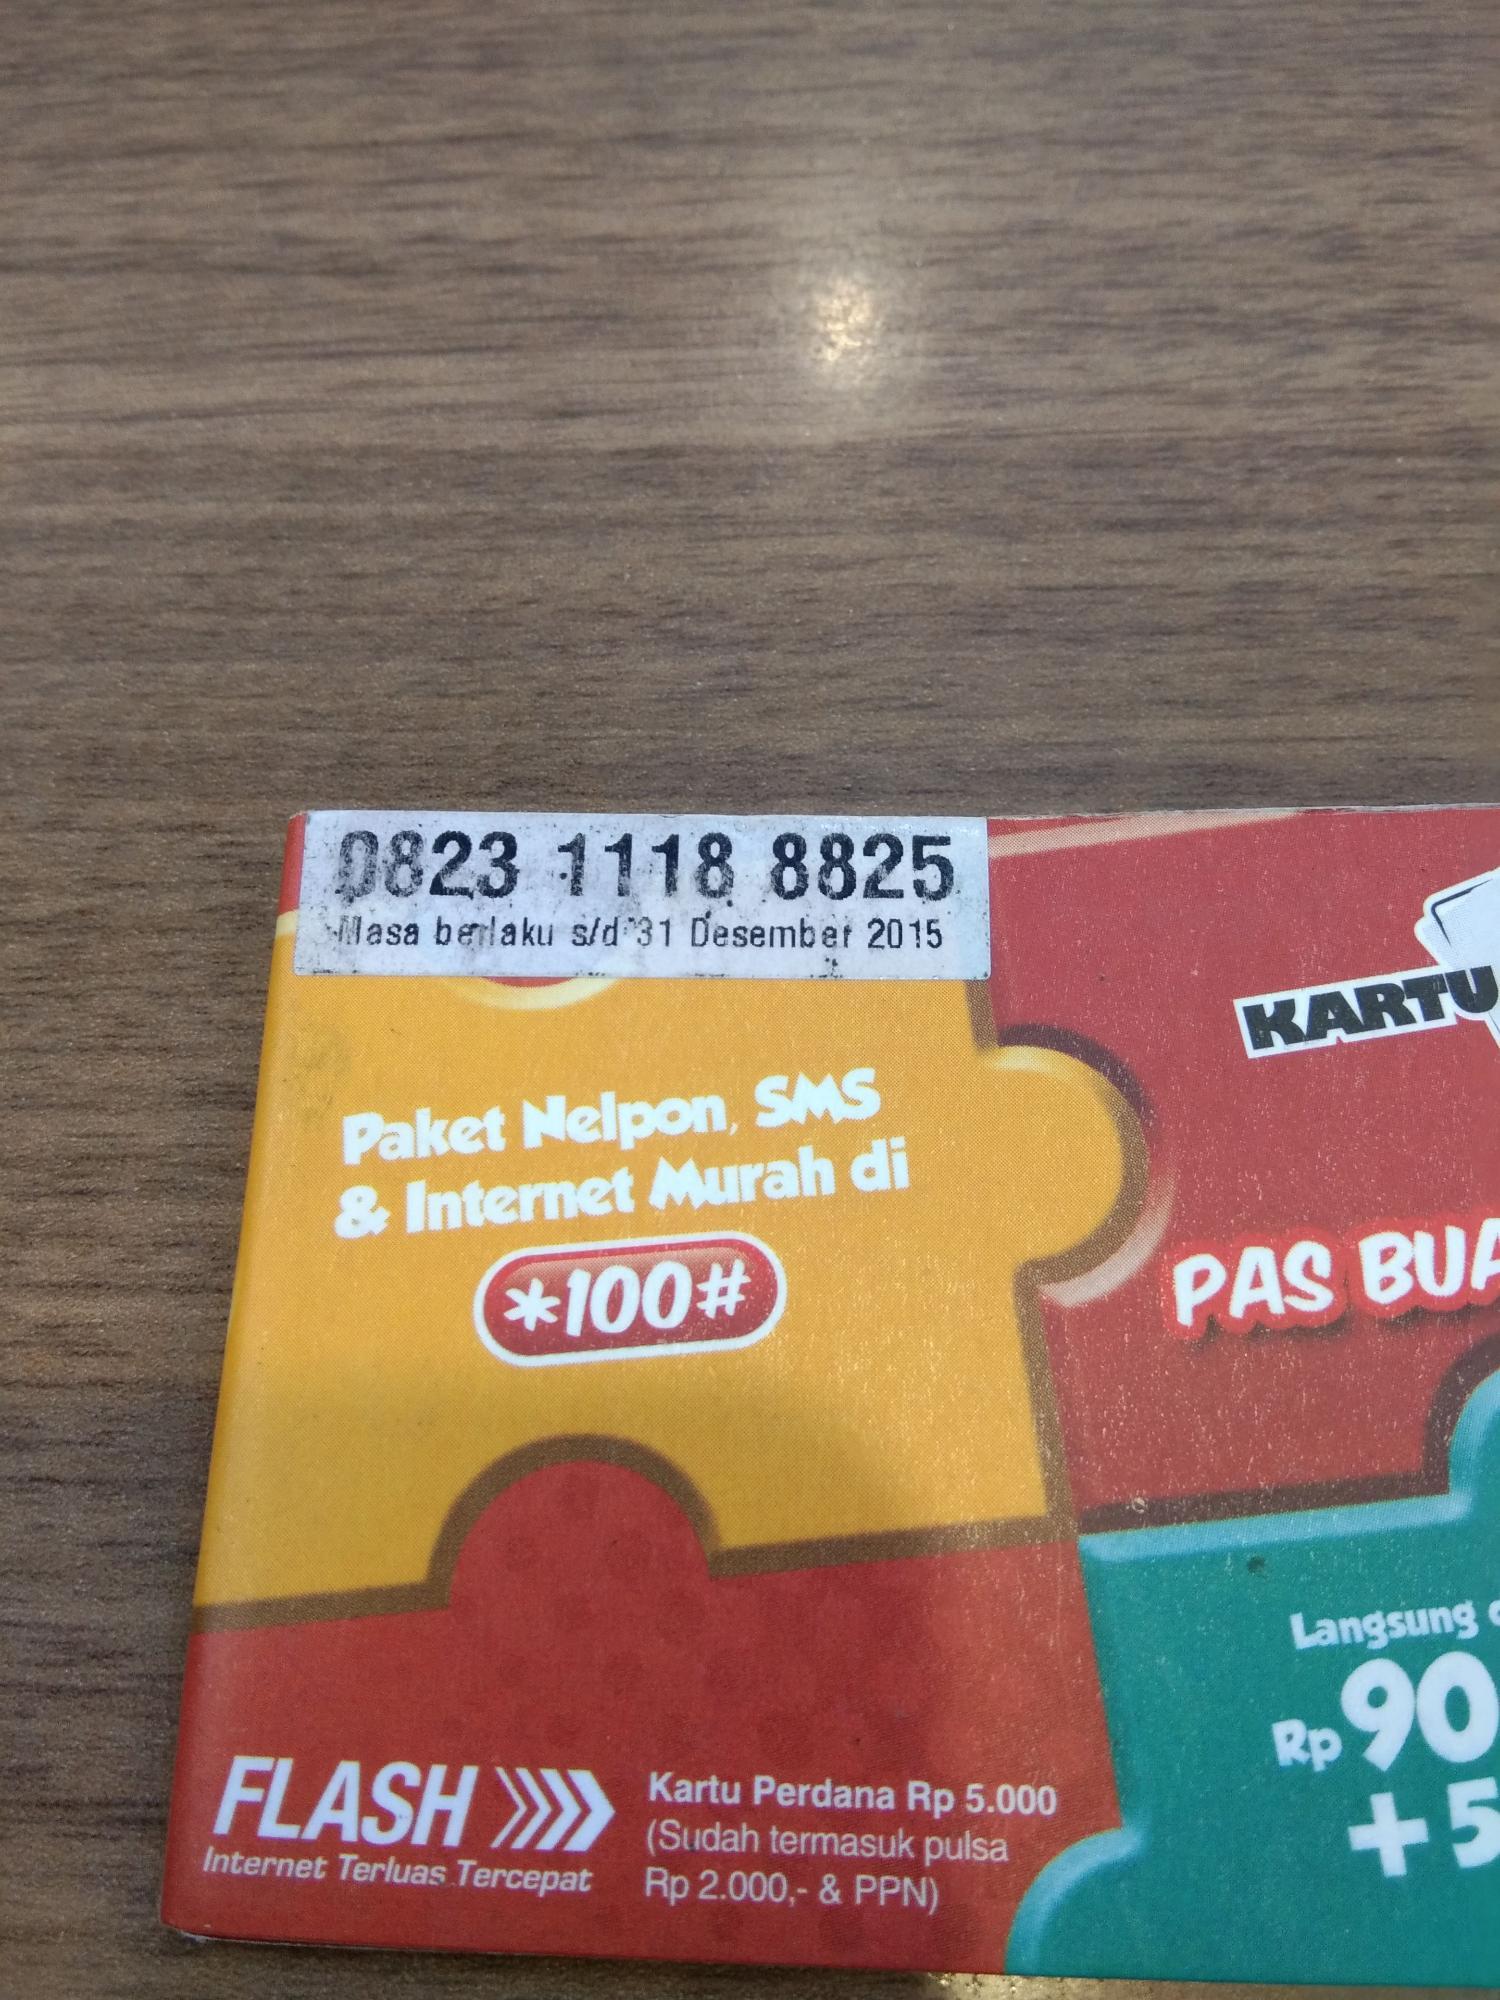 NoCan 0823 111 888 25 Nomor Cantik AS 3G